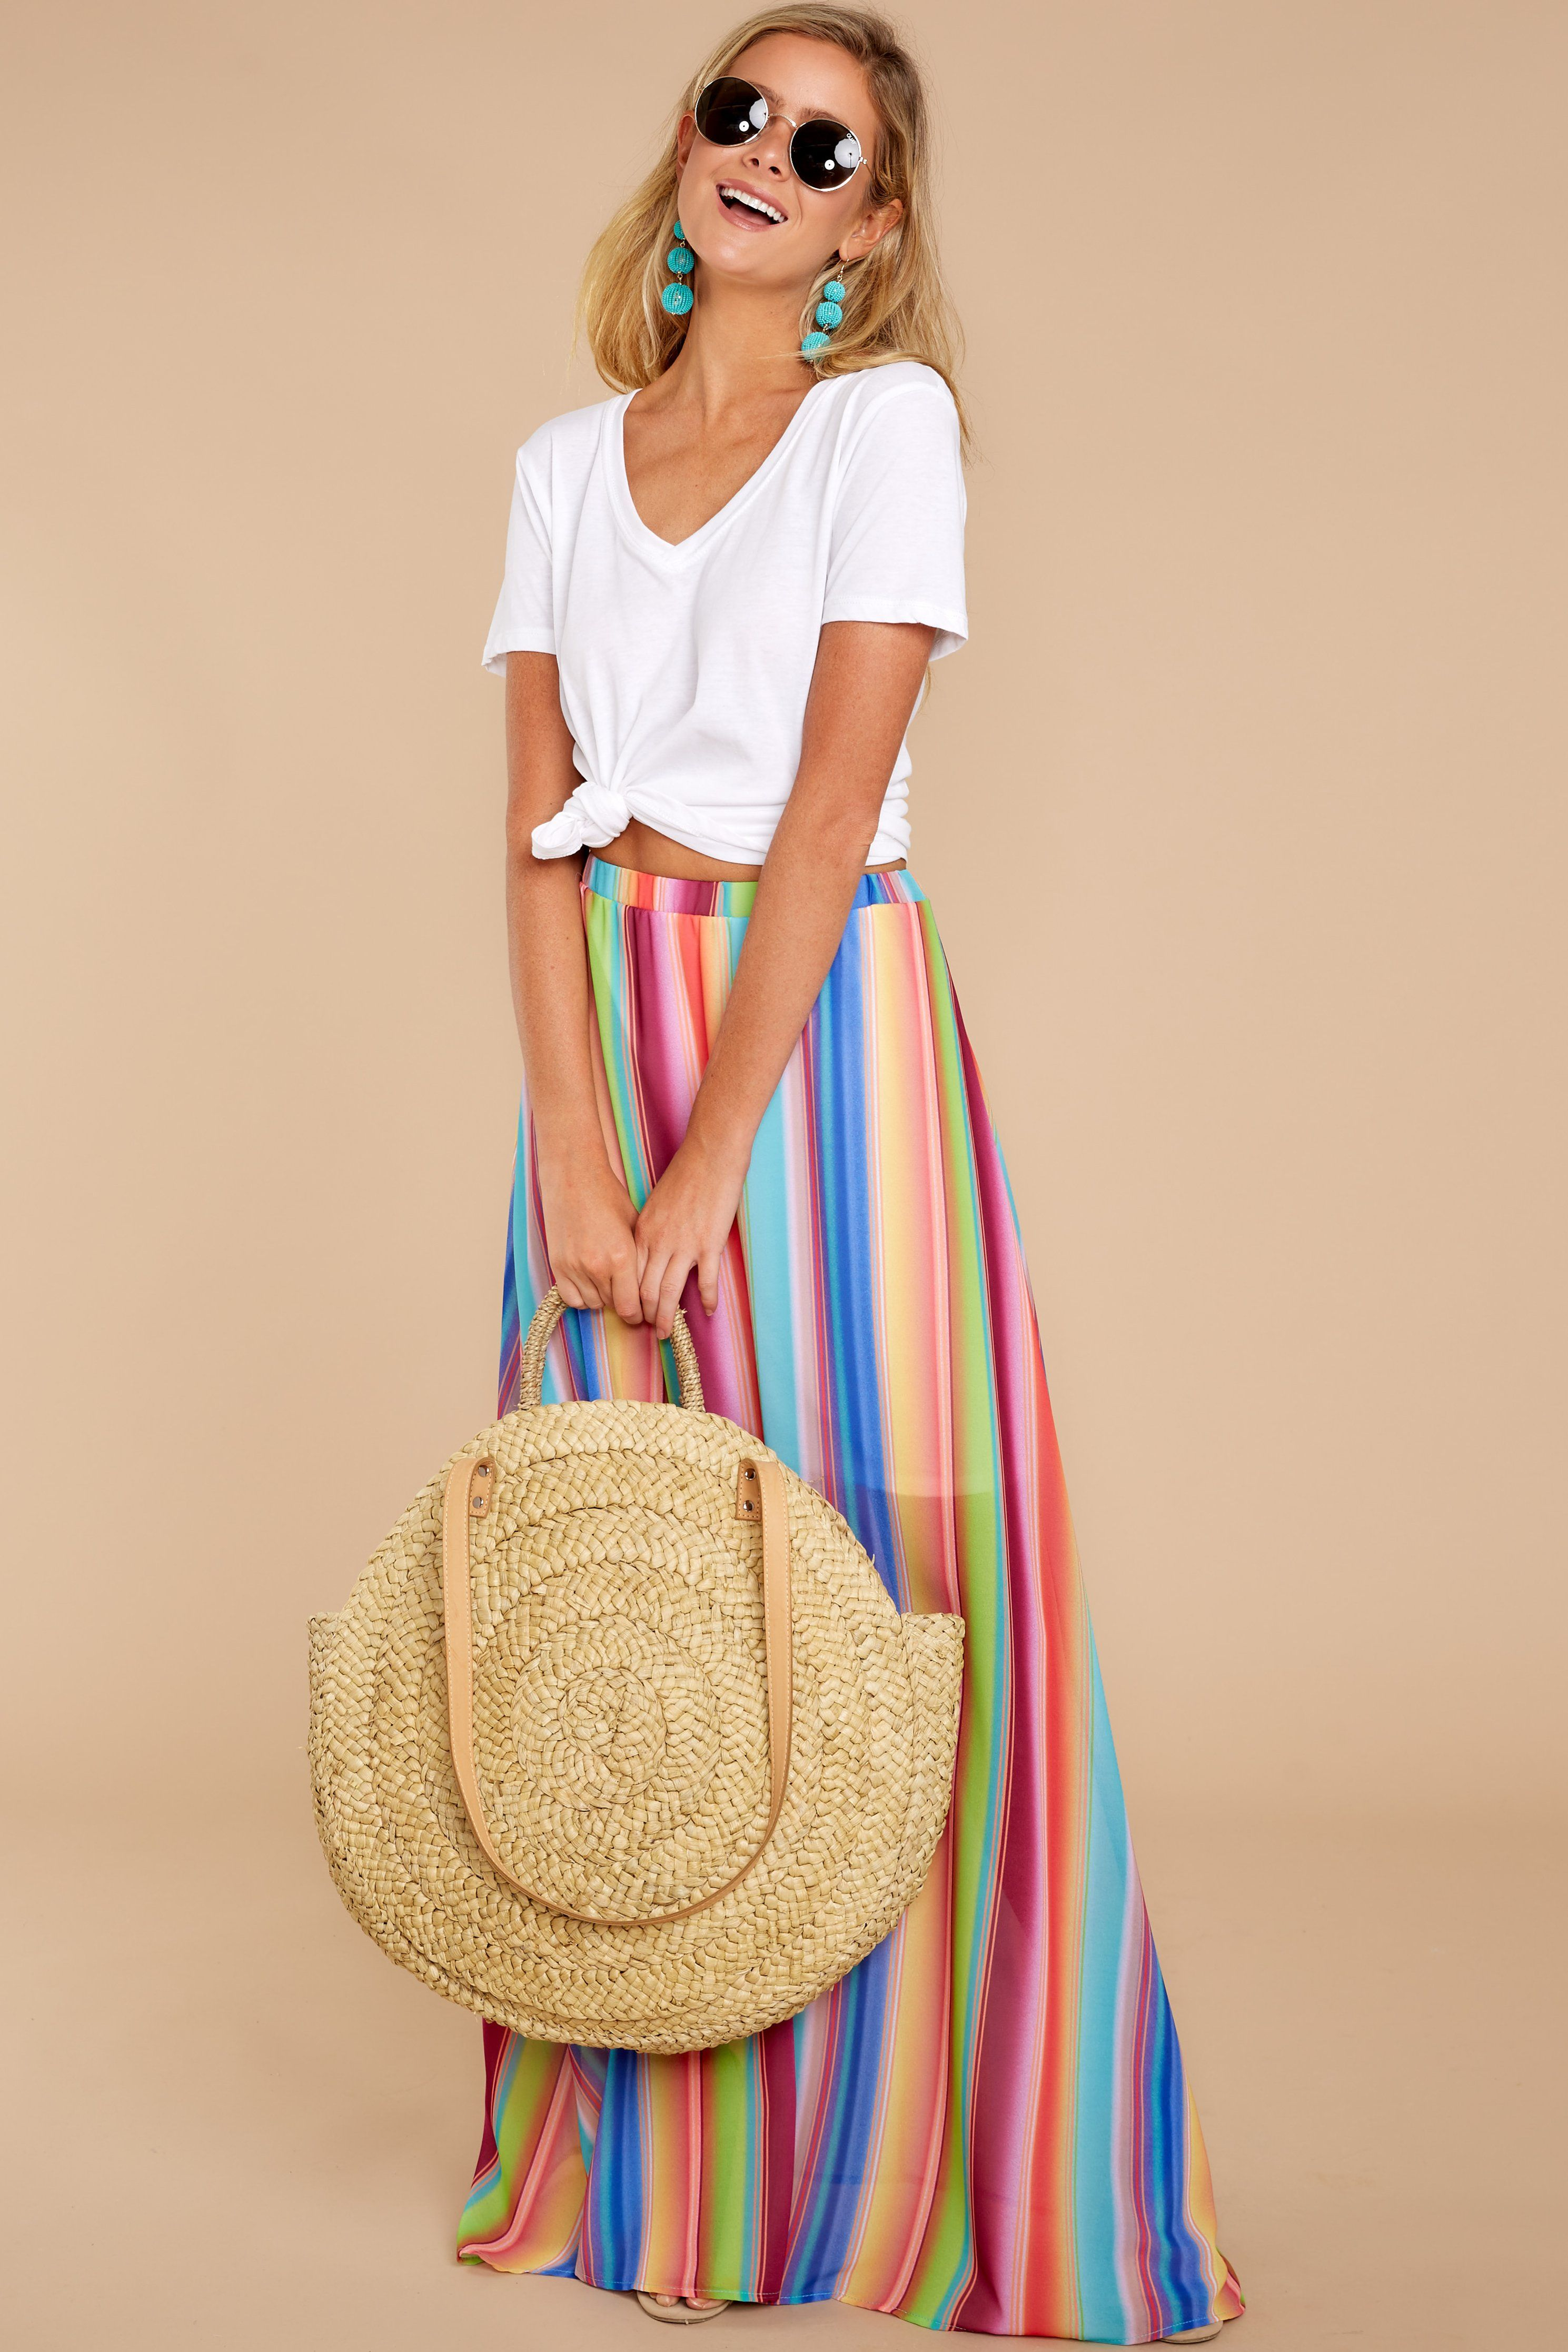 425a45e282 Chic Orange Rainbow Maxi Skirt - Trendy Maxi Skirt - Skirt - $38.00 – Red  Dress Boutique